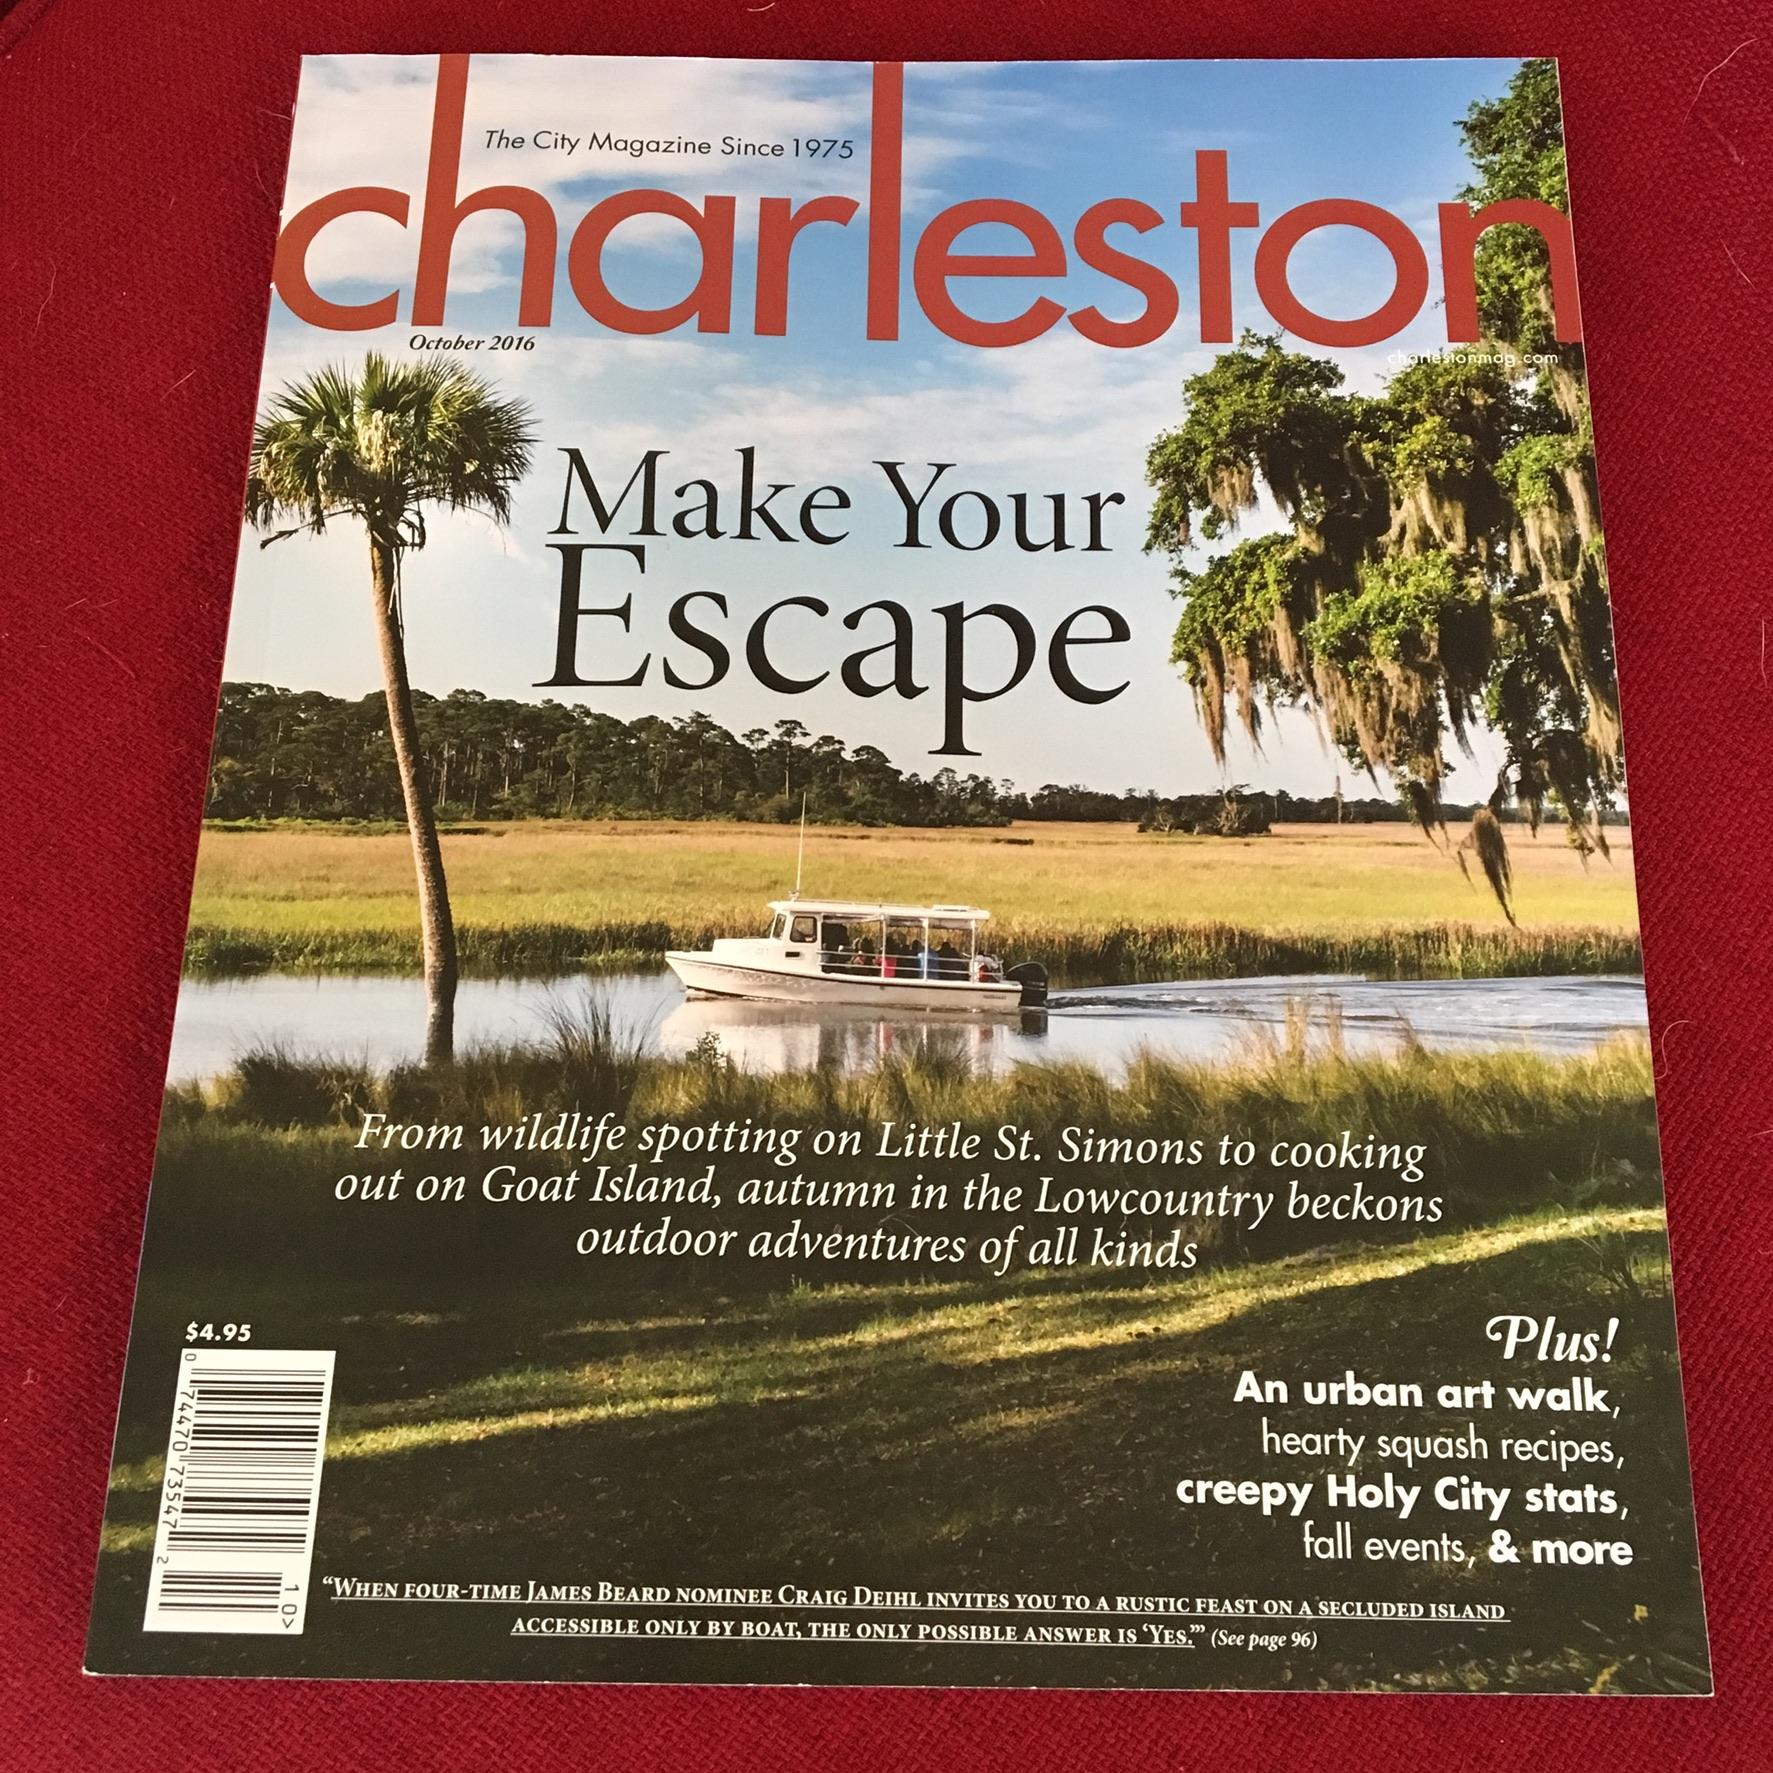 Charleston Magazine, October 2016 issue